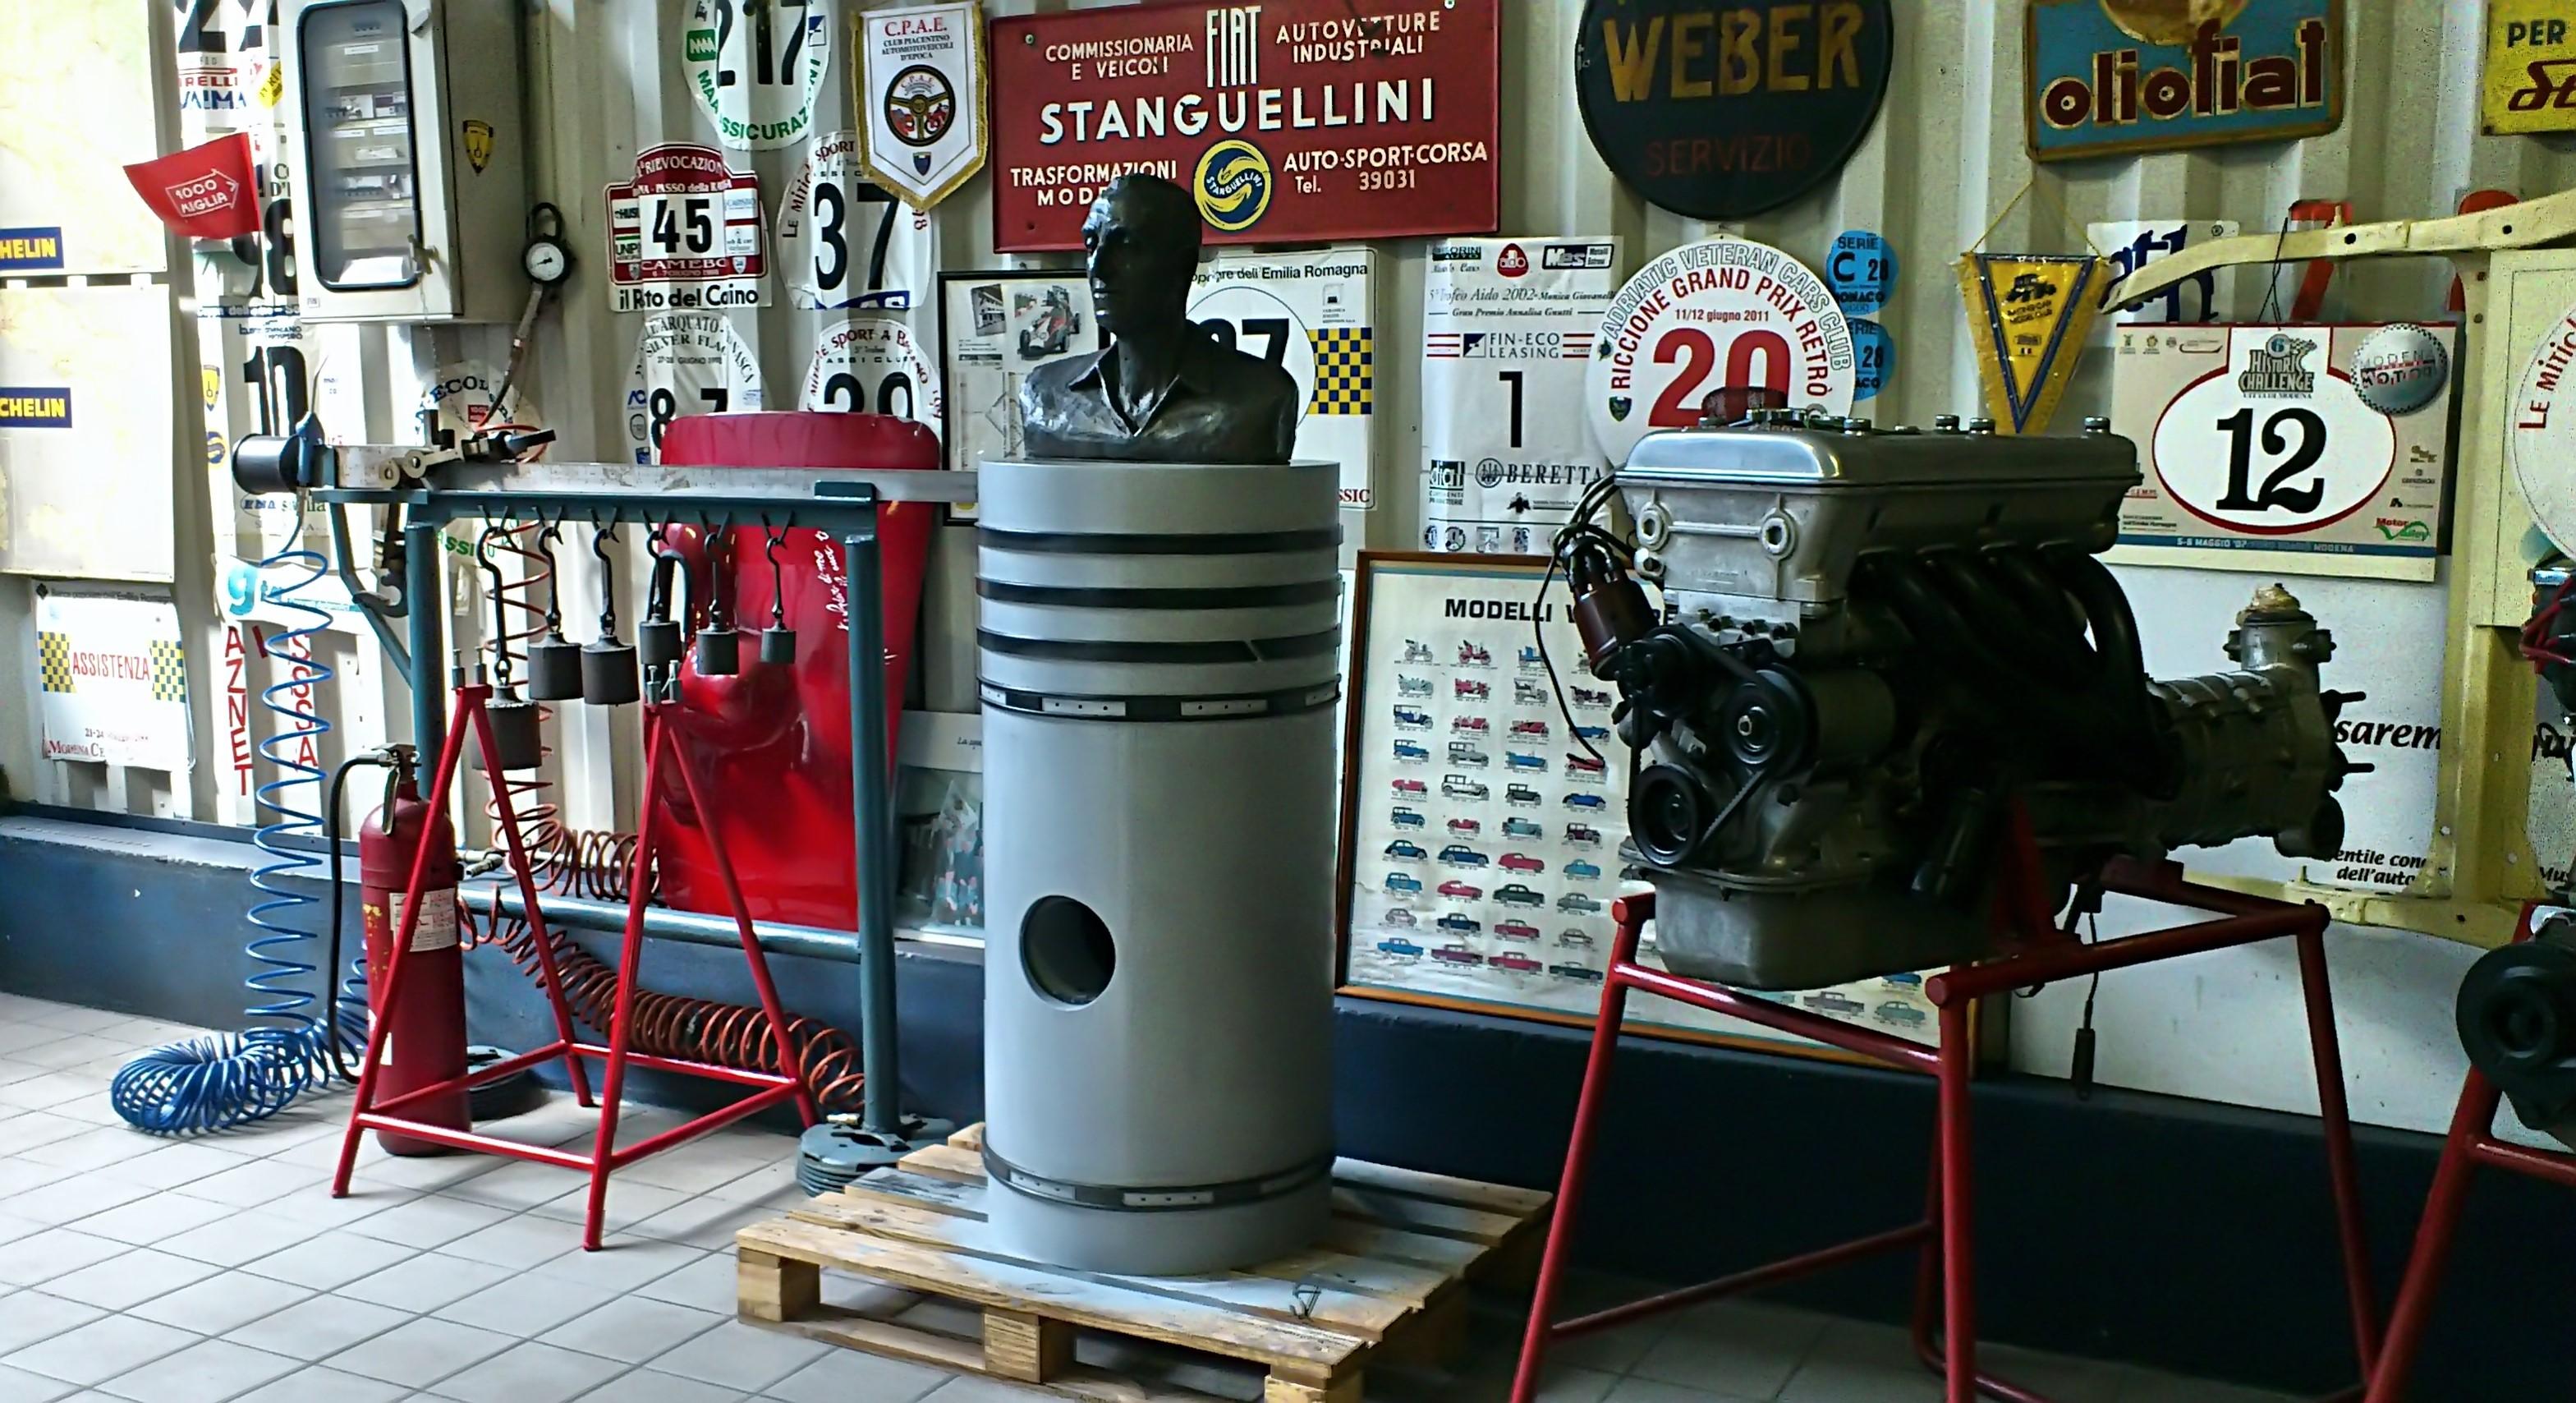 Museo Stanguellini (23).jpg